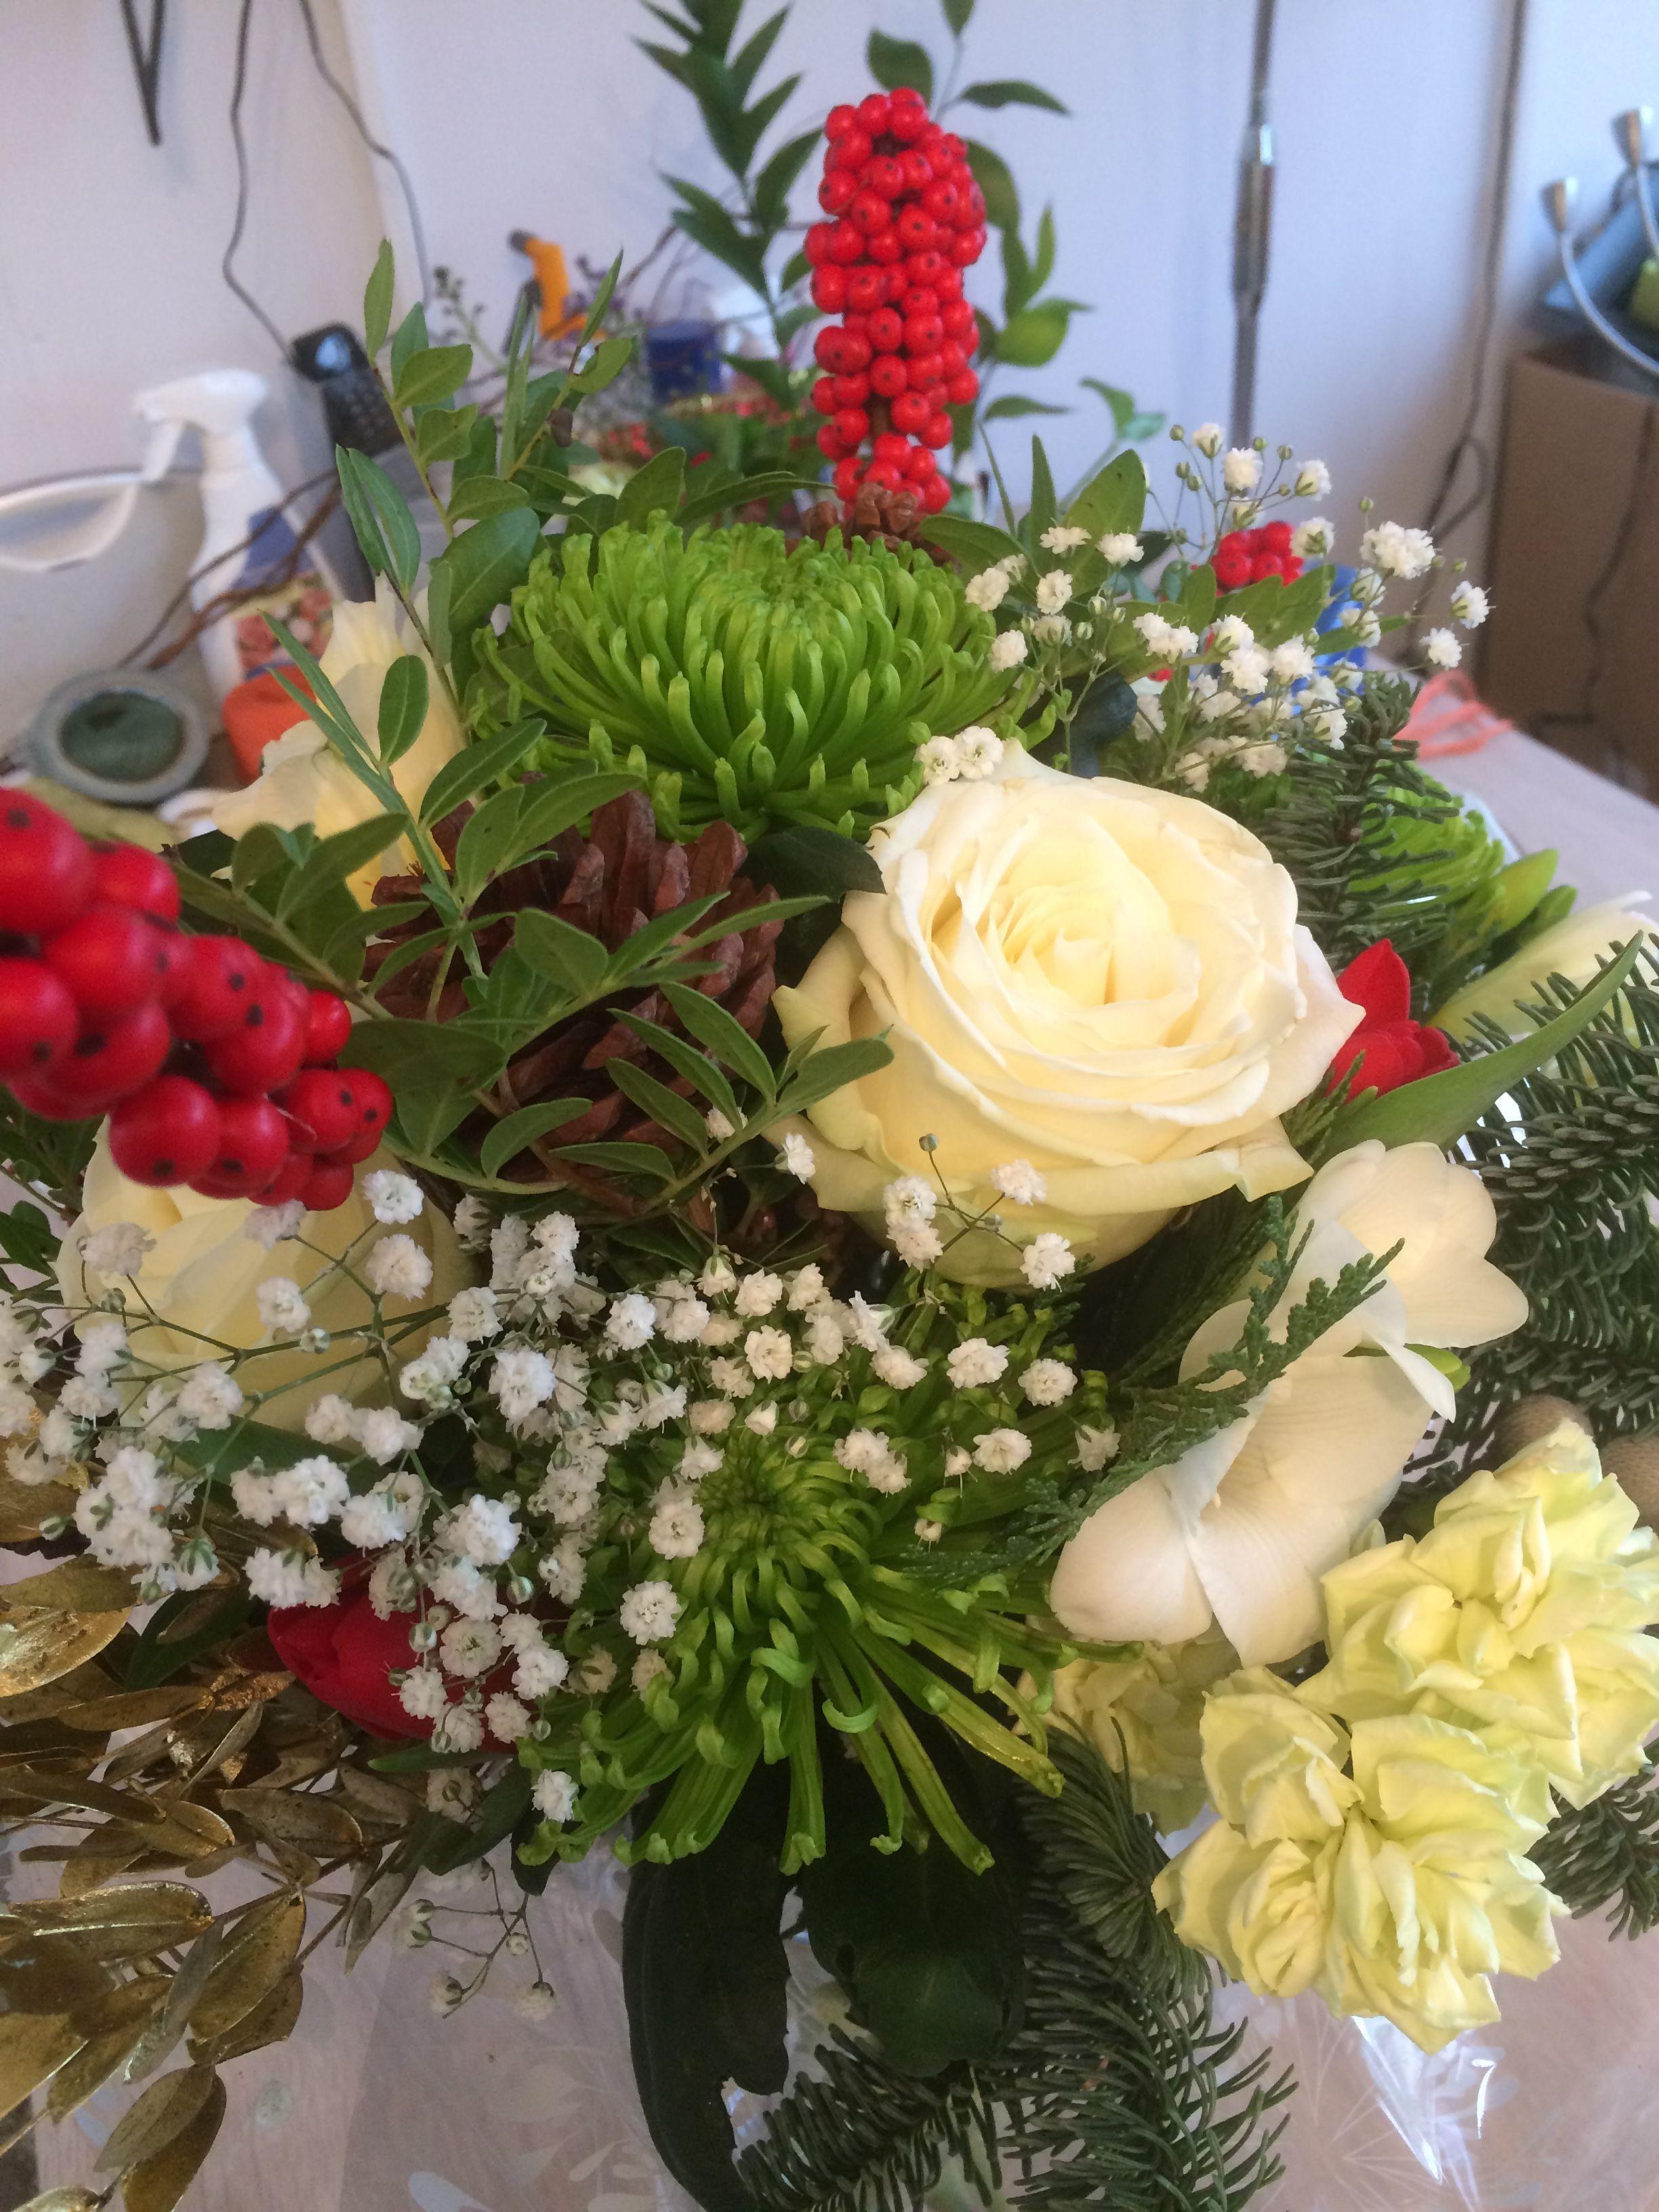 Seasonal christmas luxury gift flower bouquet created by willow seasonal christmas luxury gift flower bouquet created by willow house flowers aylesbury florist izmirmasajfo